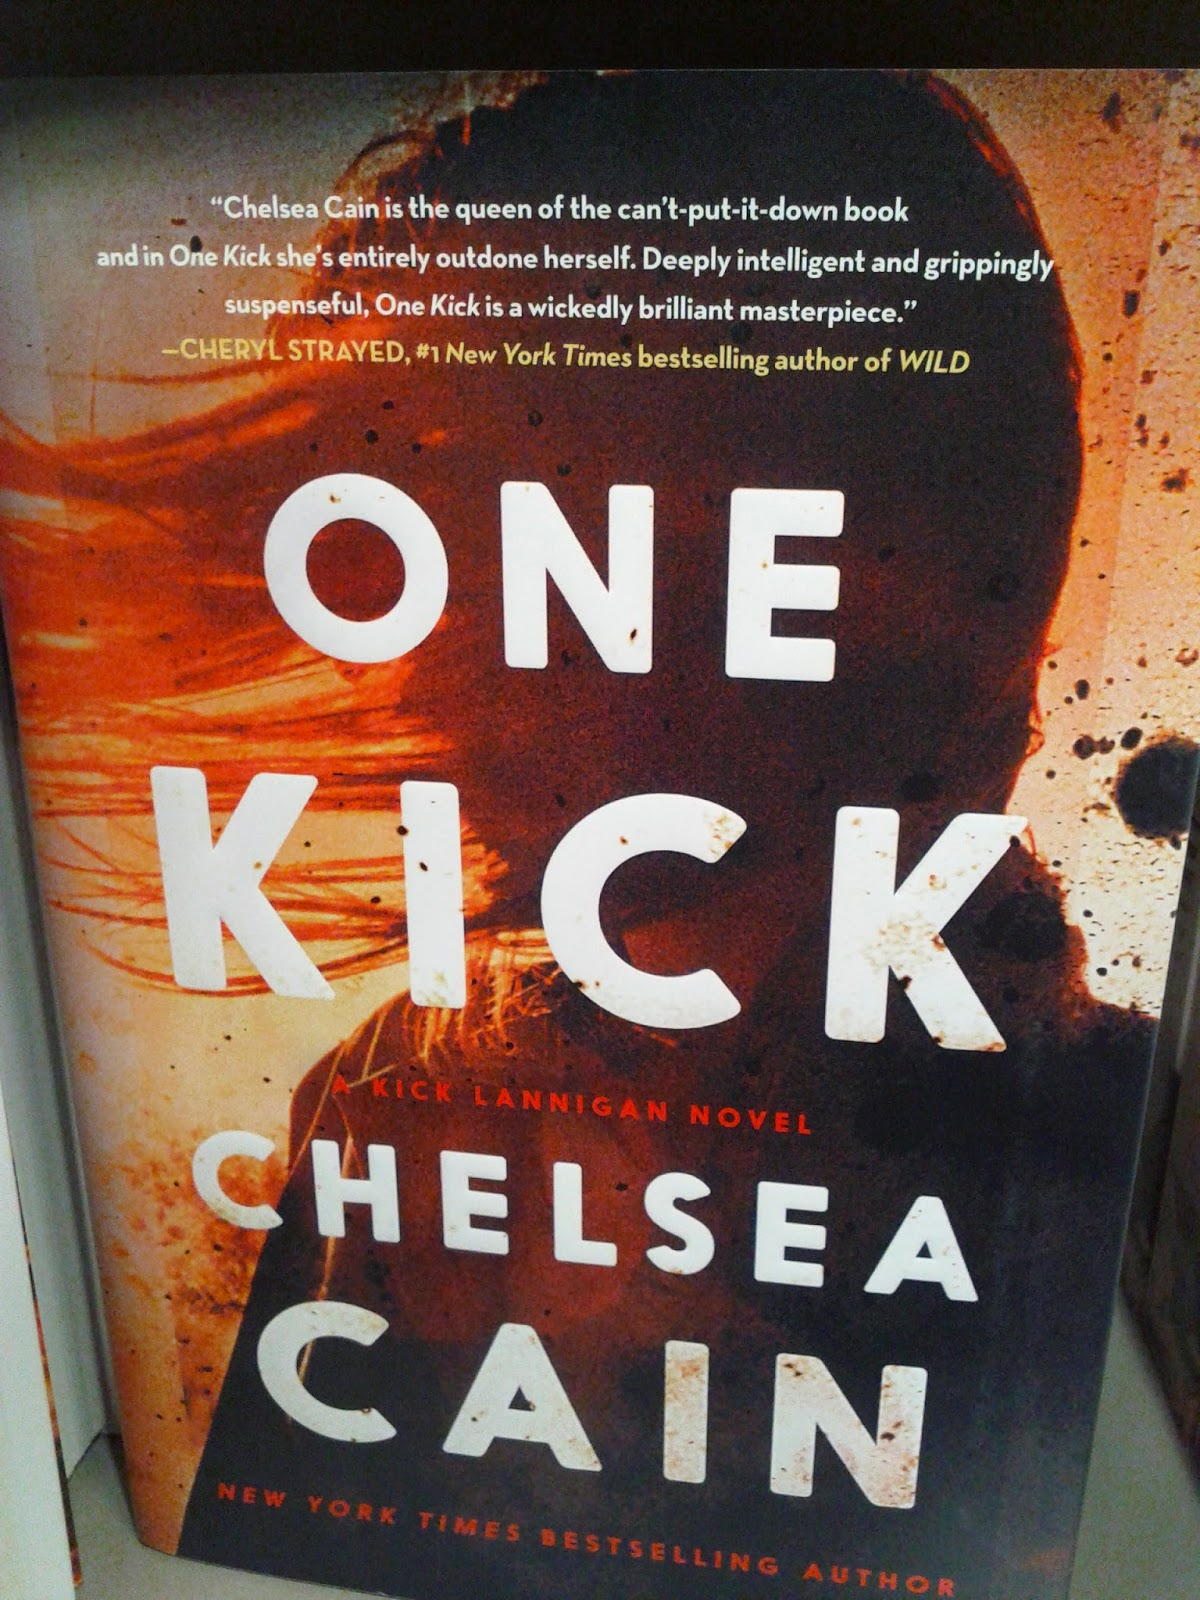 One Kick Chelsea Cain